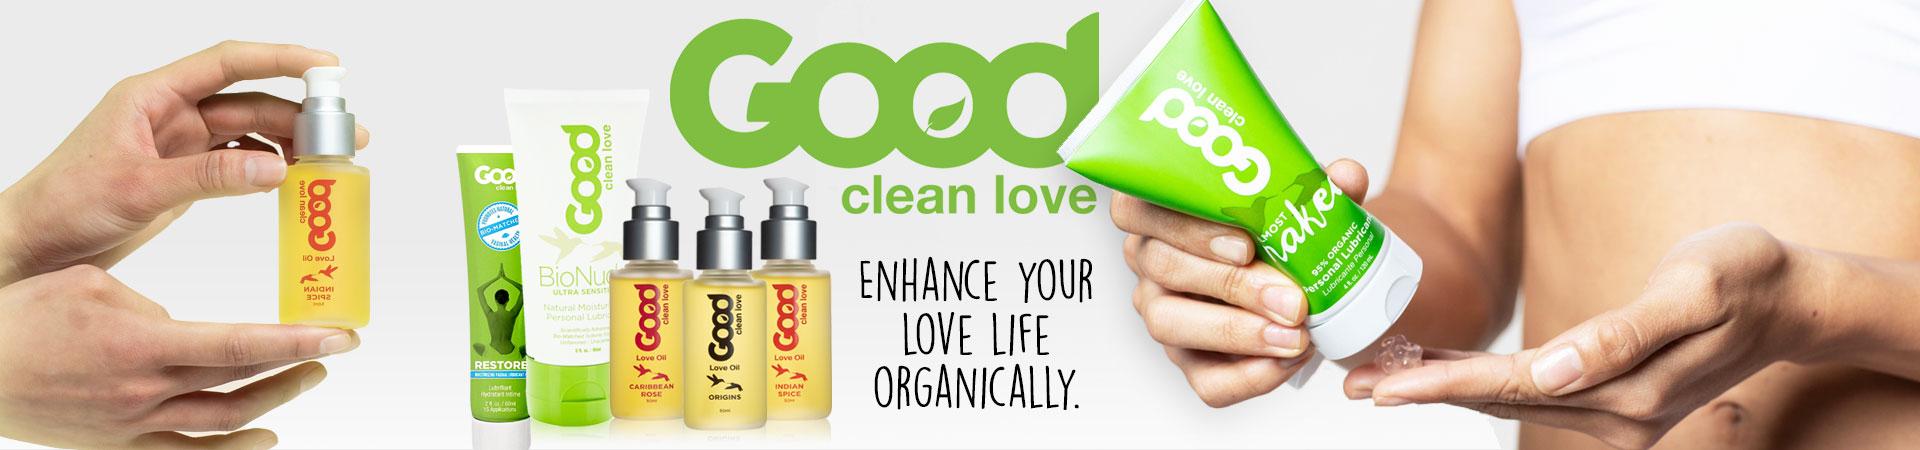 Good Clean Love - Enhance Your Love Life Organically